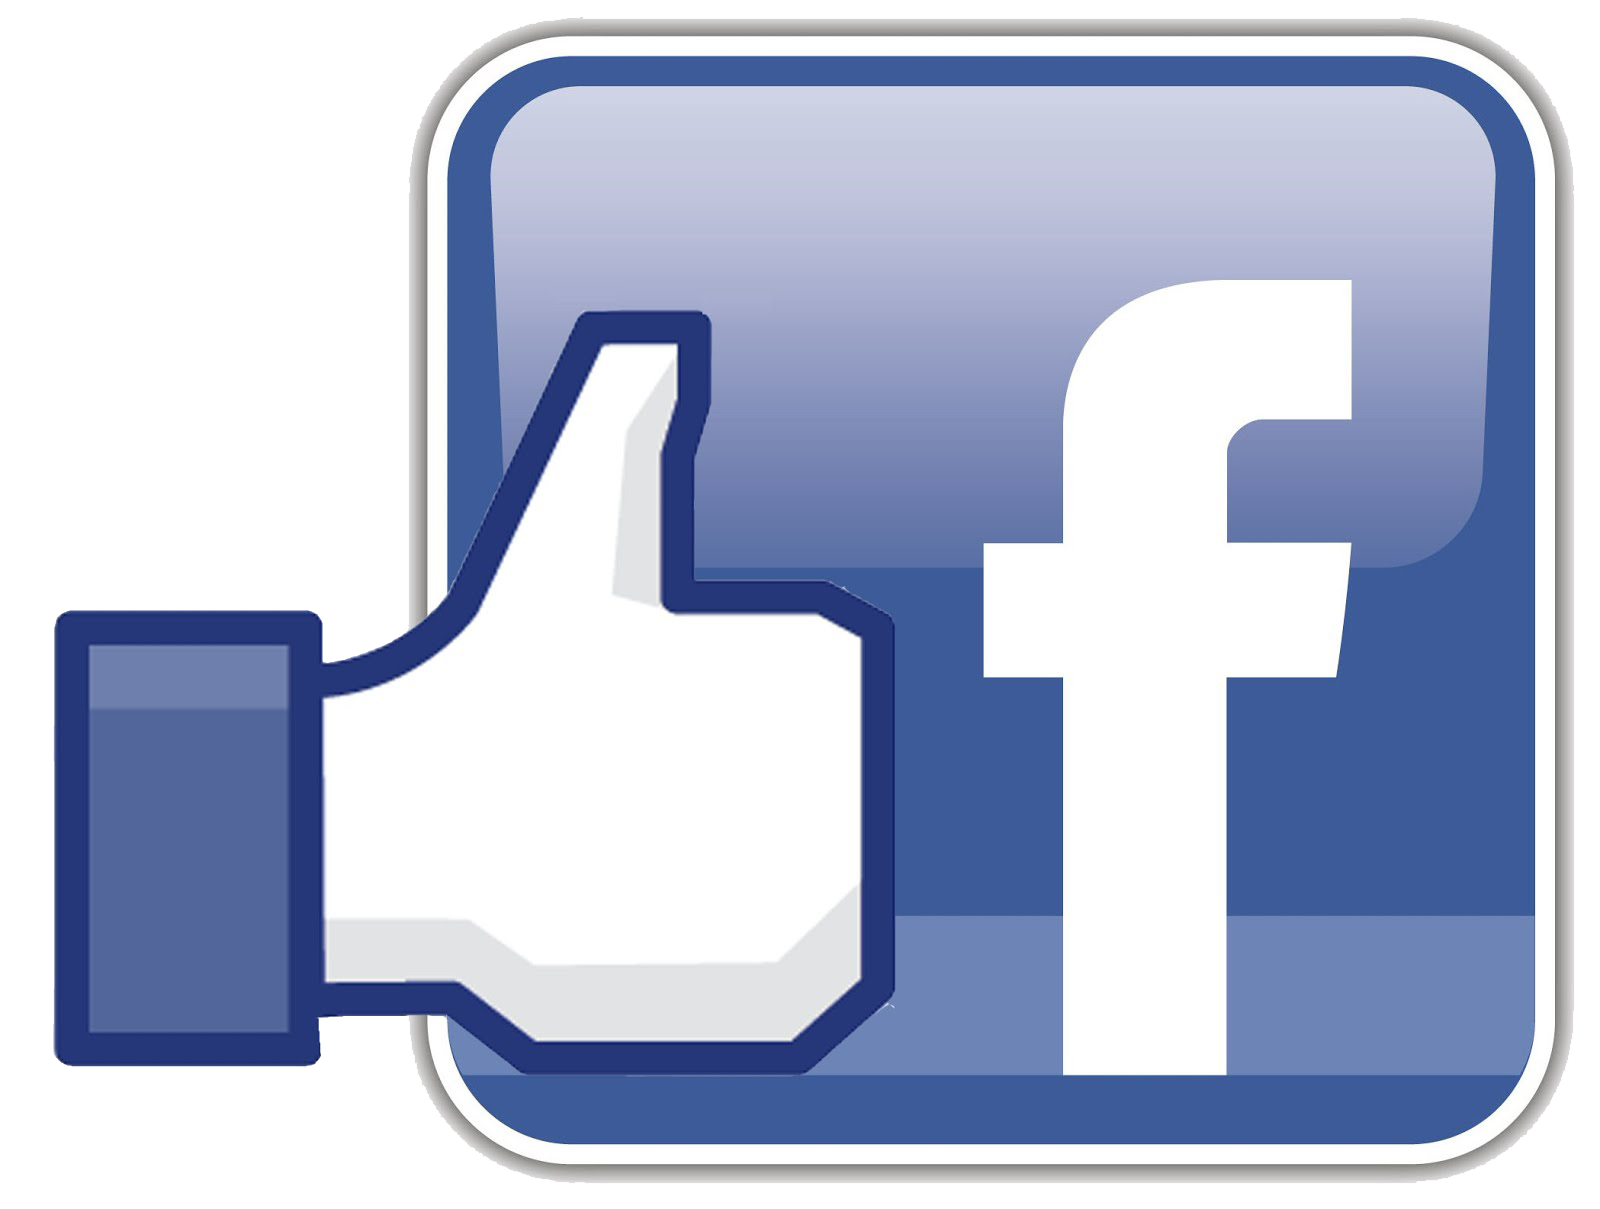 Facebook logos png images. Want clipart transparent